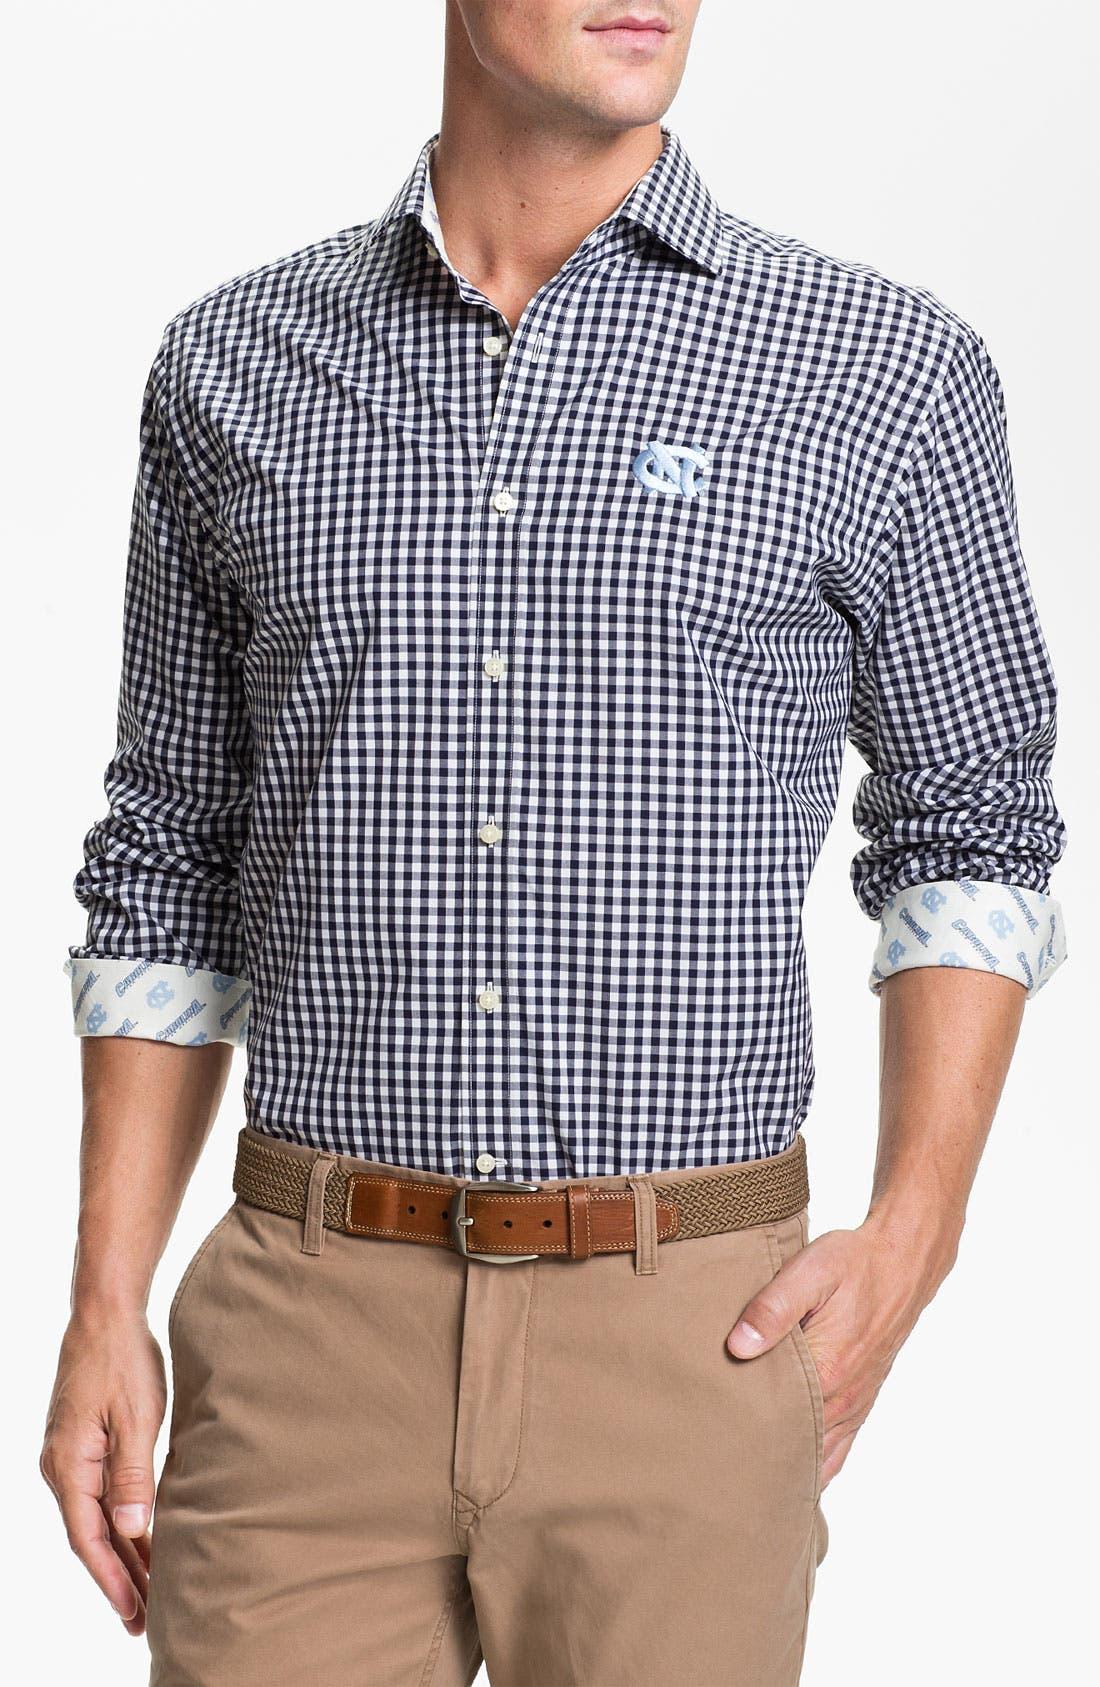 Main Image - Thomas Dean 'University of North Carolina' Gingham Sport Shirt